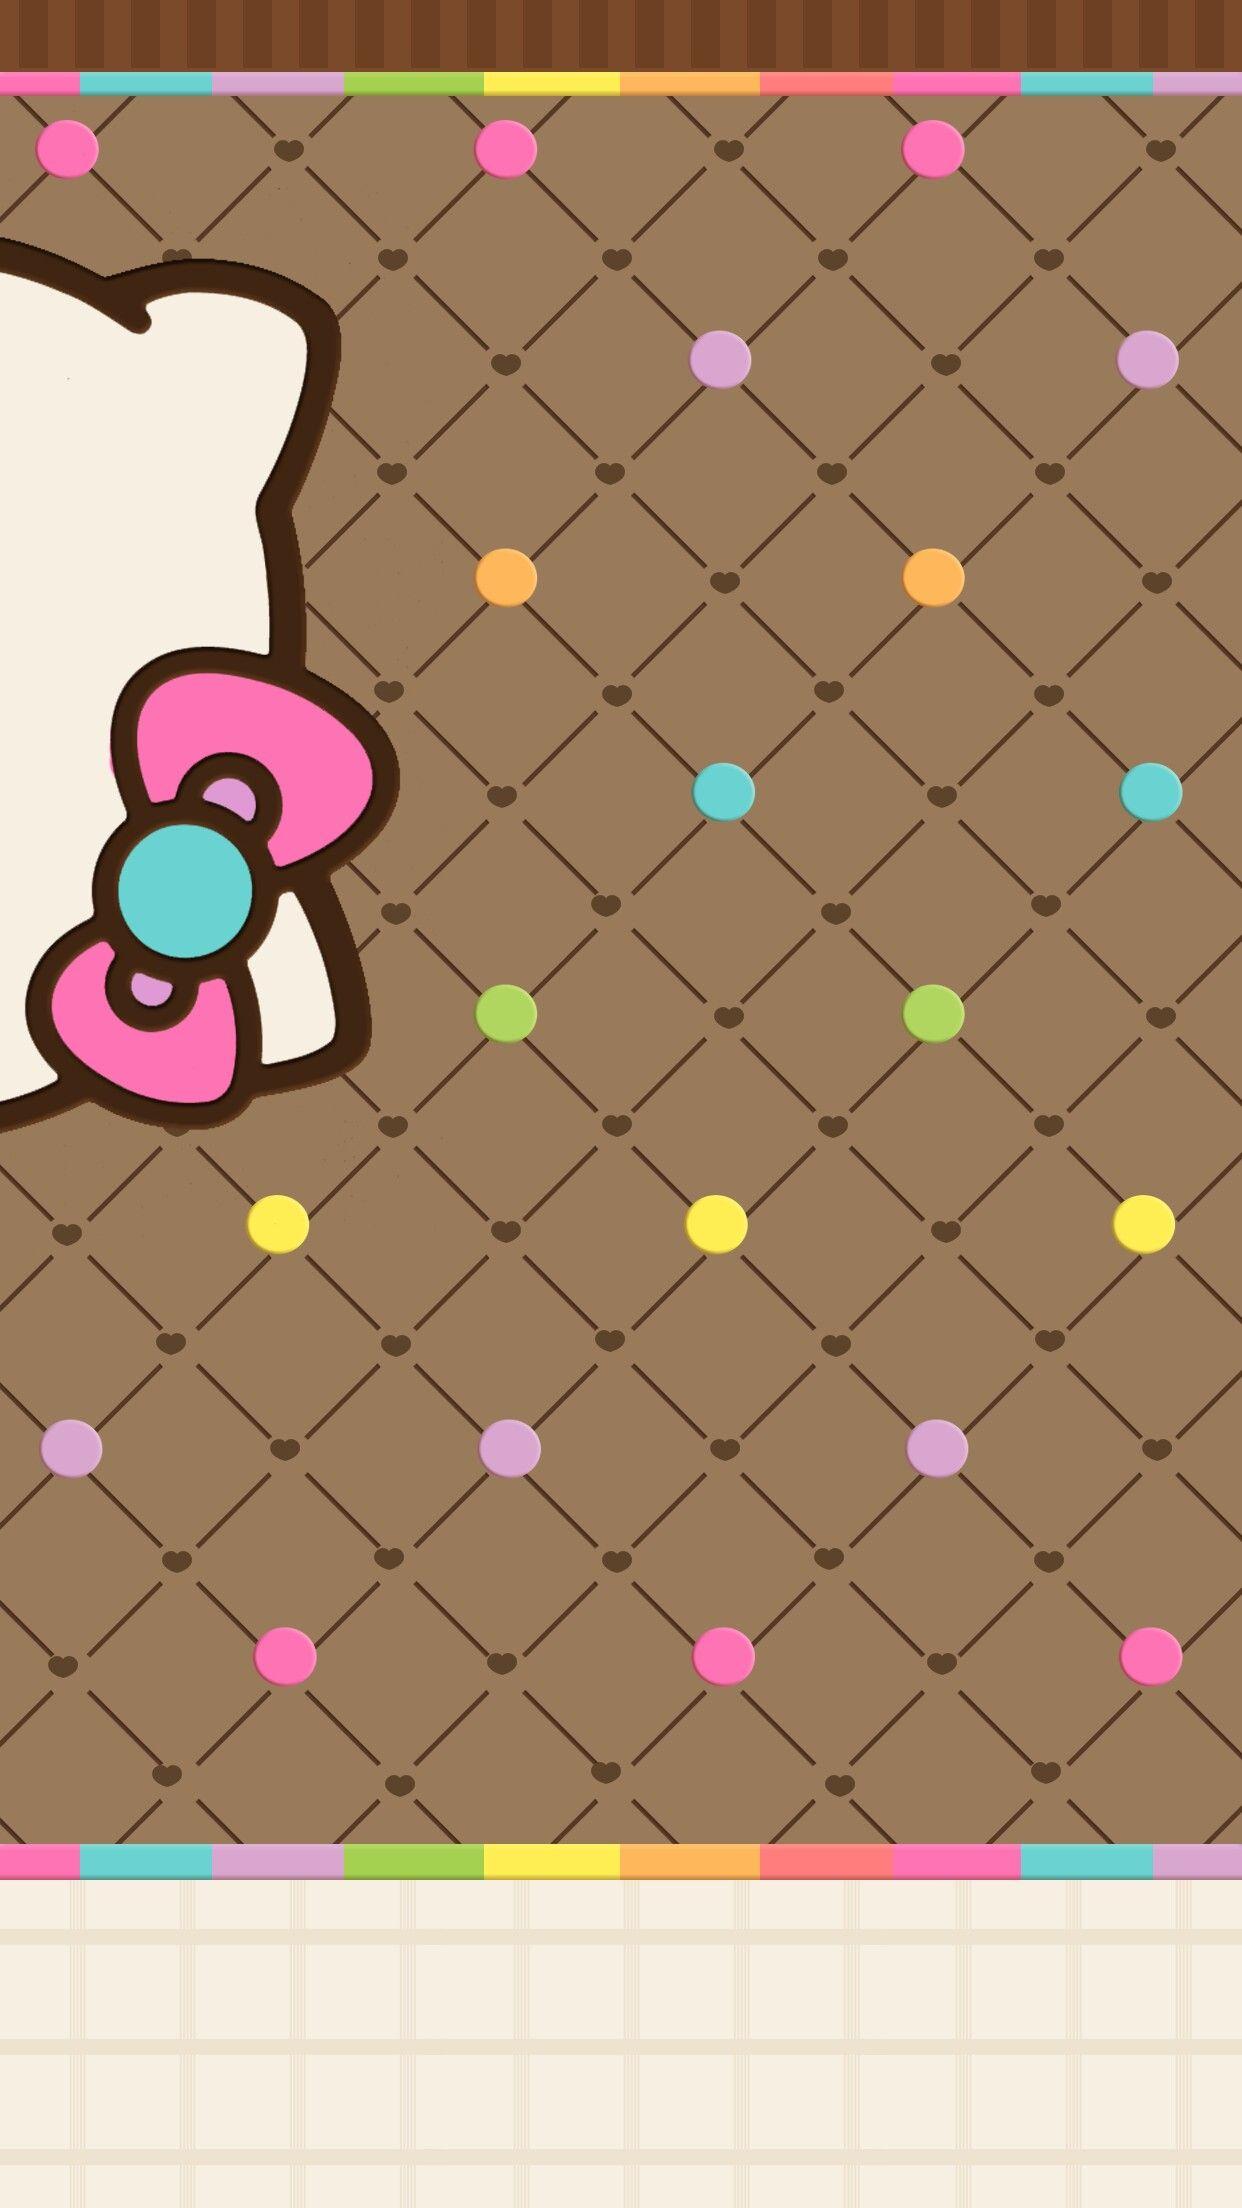 Simple Wallpaper Hello Kitty Wall - 4695785c0d060f0328976851cbfa2ef4  2018_337819.jpg